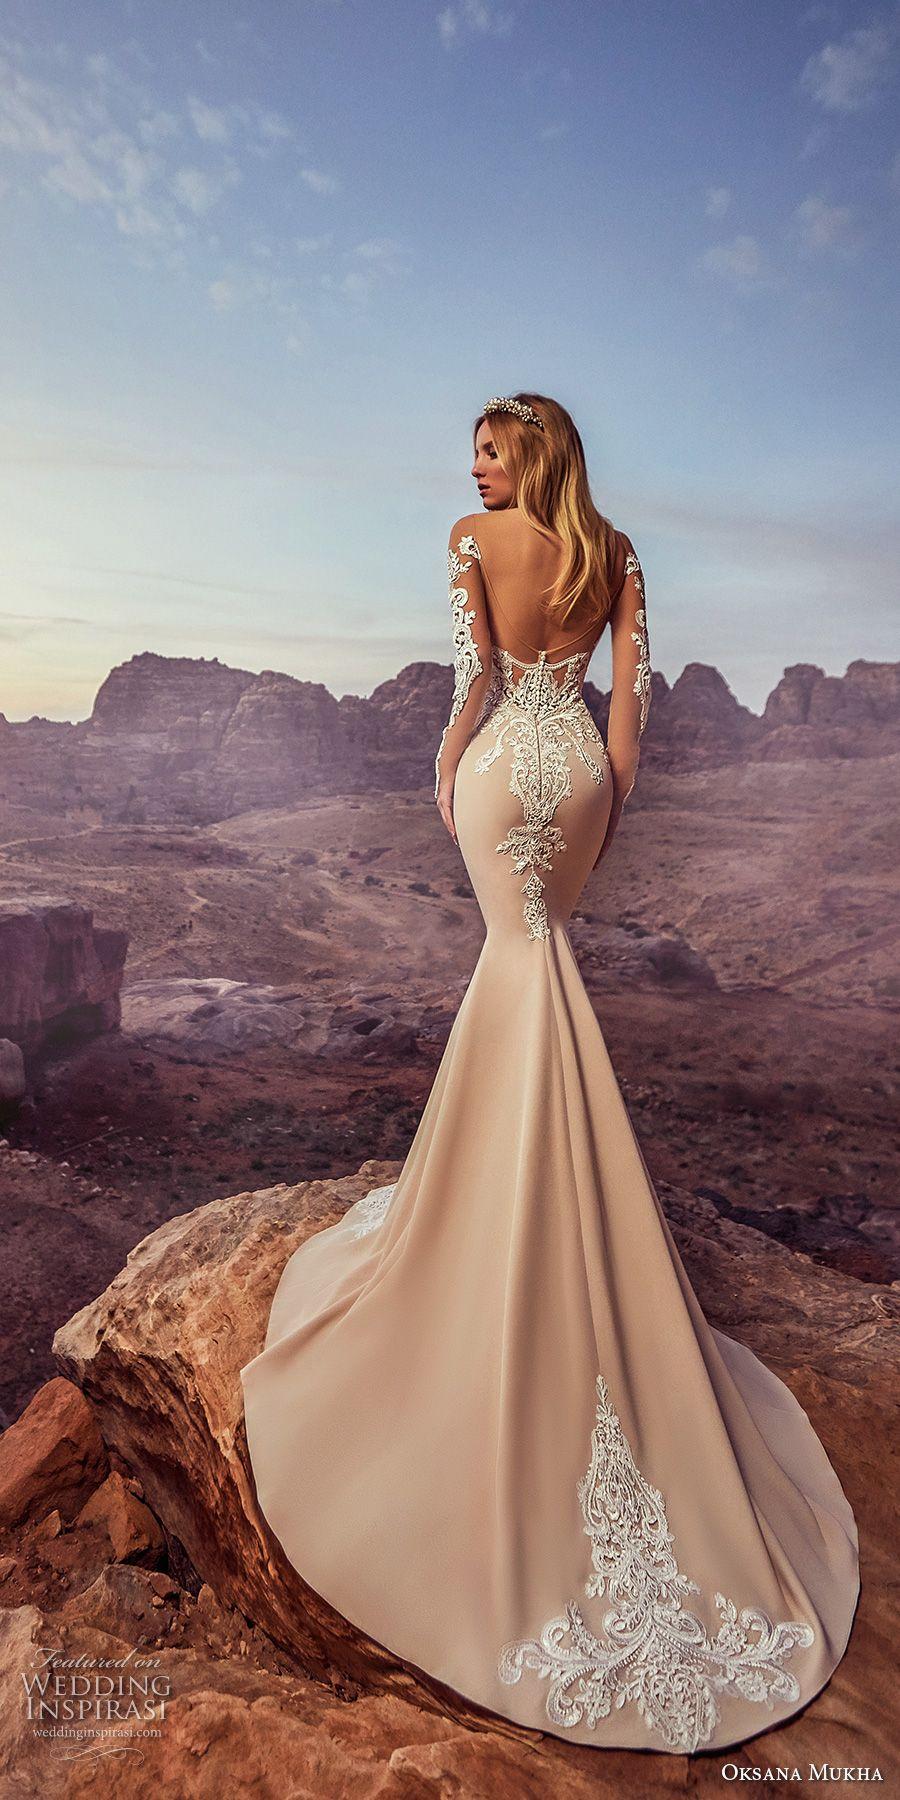 Oksana mukha wedding dresses wedding dress wedding and weddings